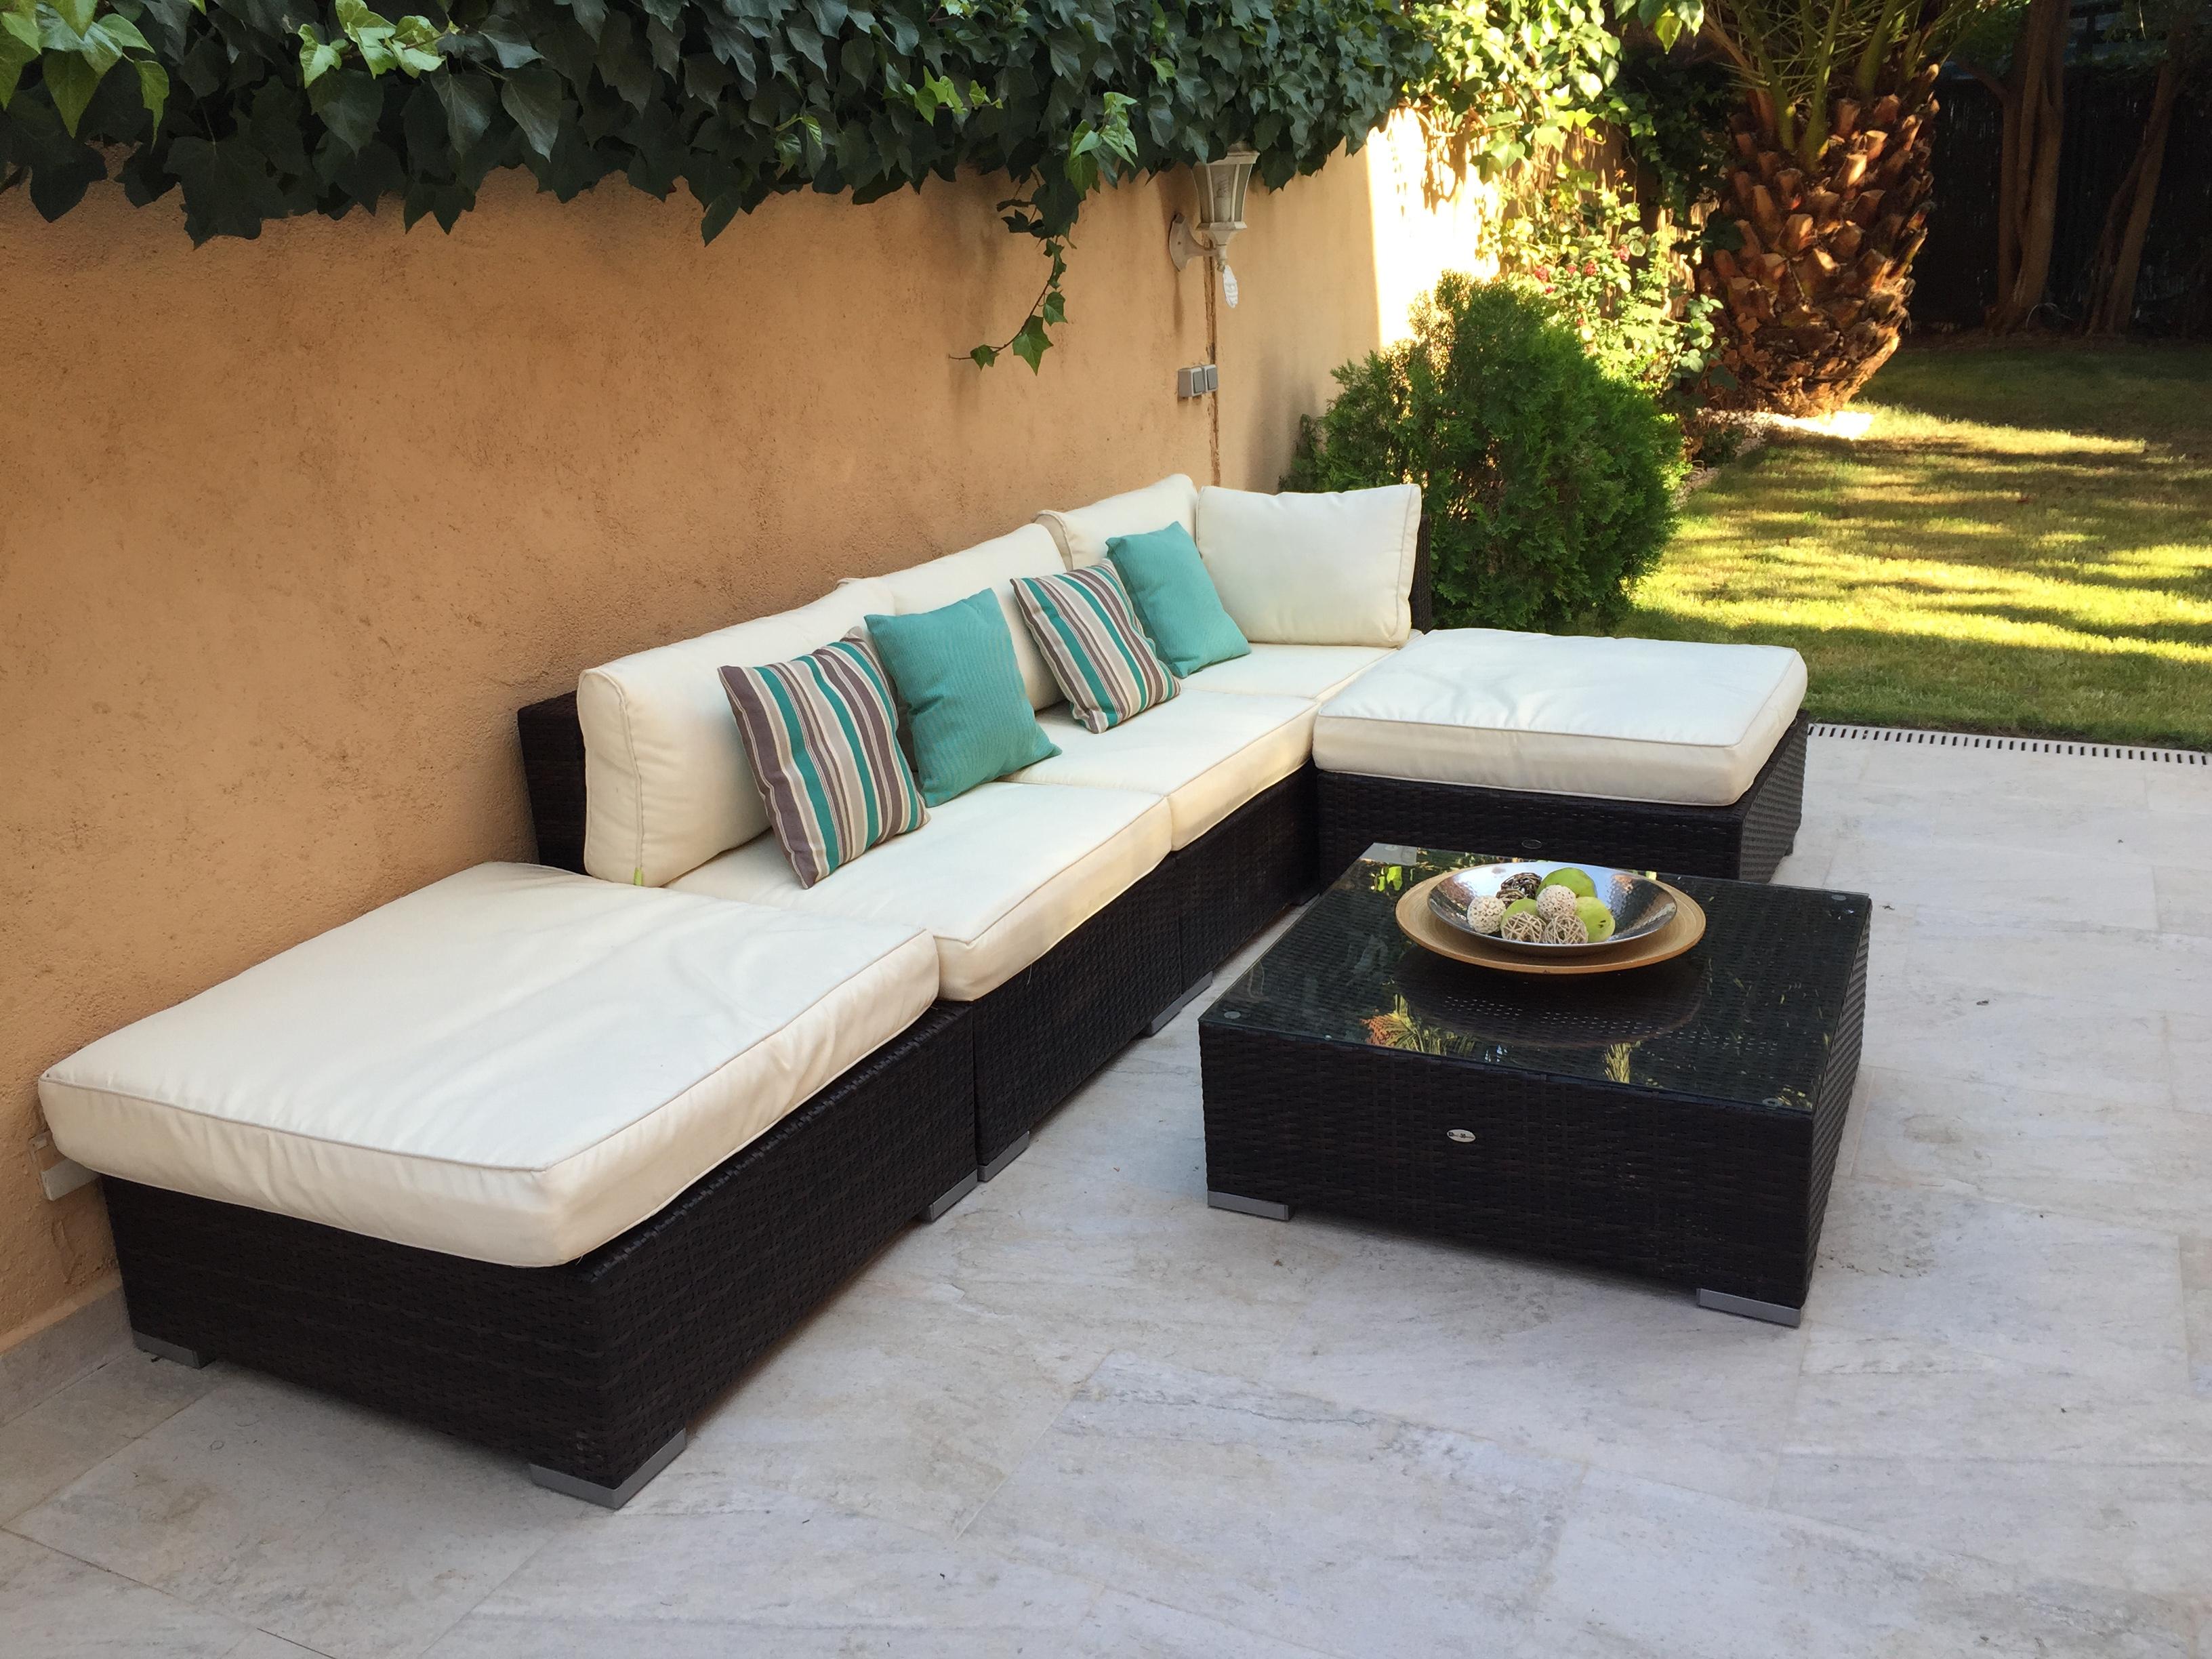 salon de jardin 7 places en resine tressee milano